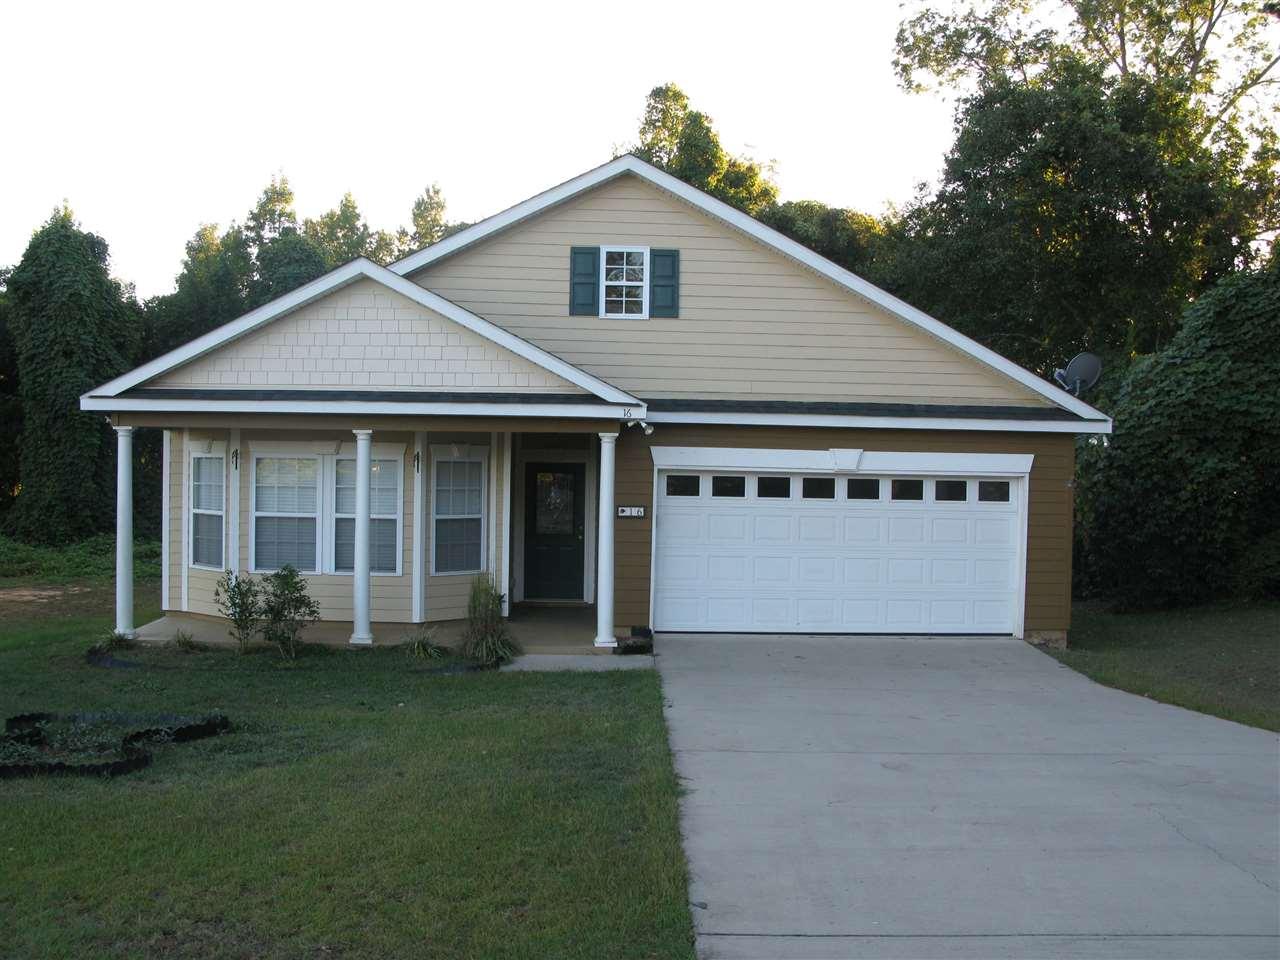 Property ID 261130